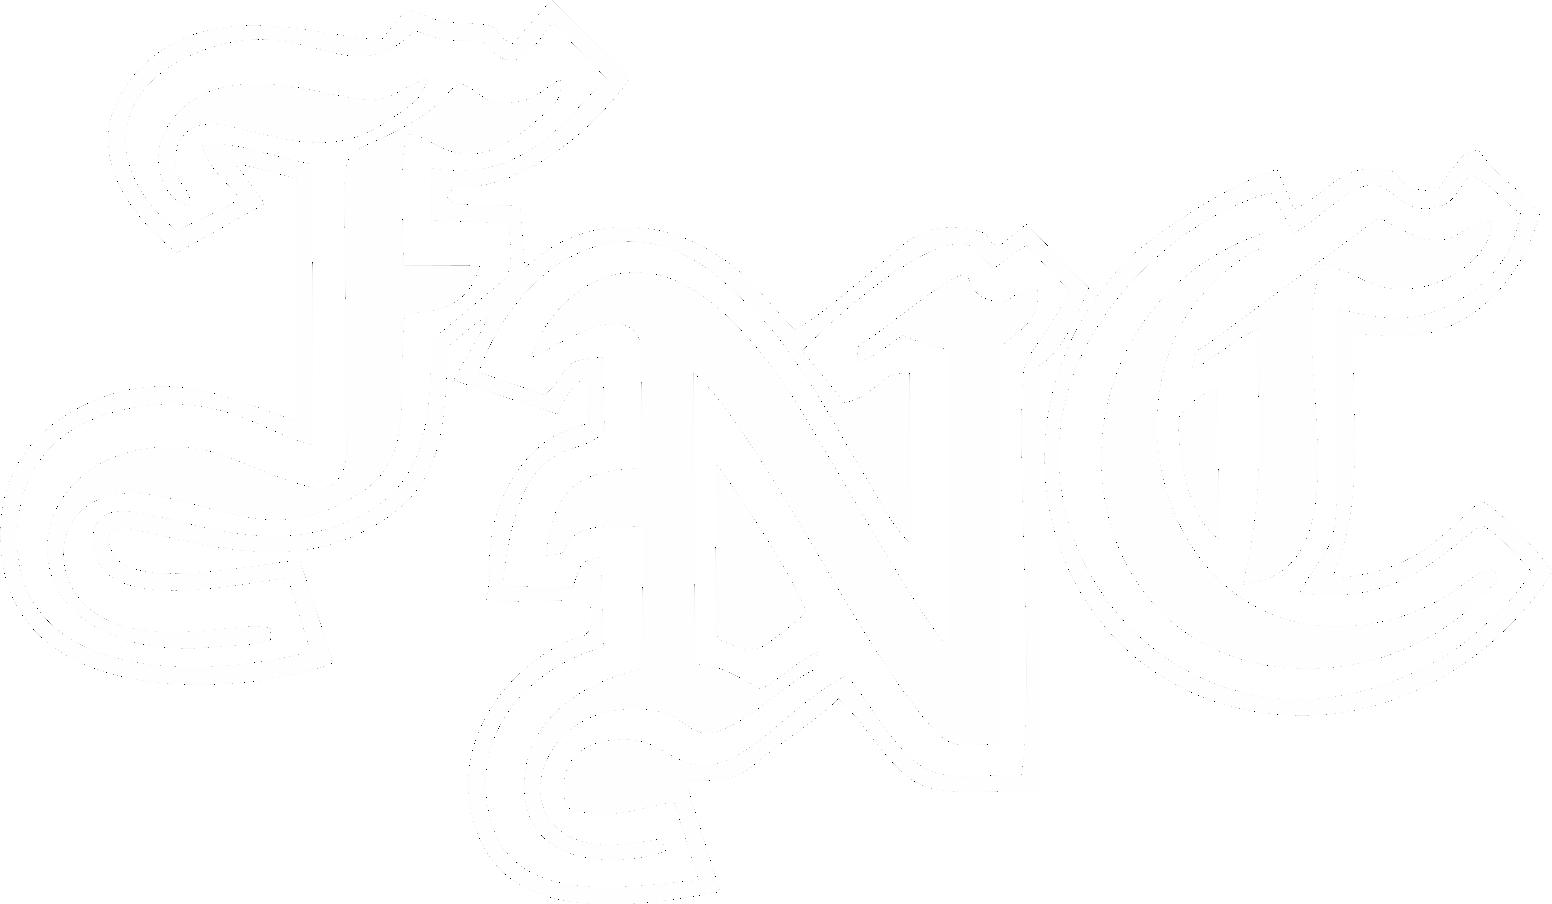 Fundatia Academician Nicolae Cajal